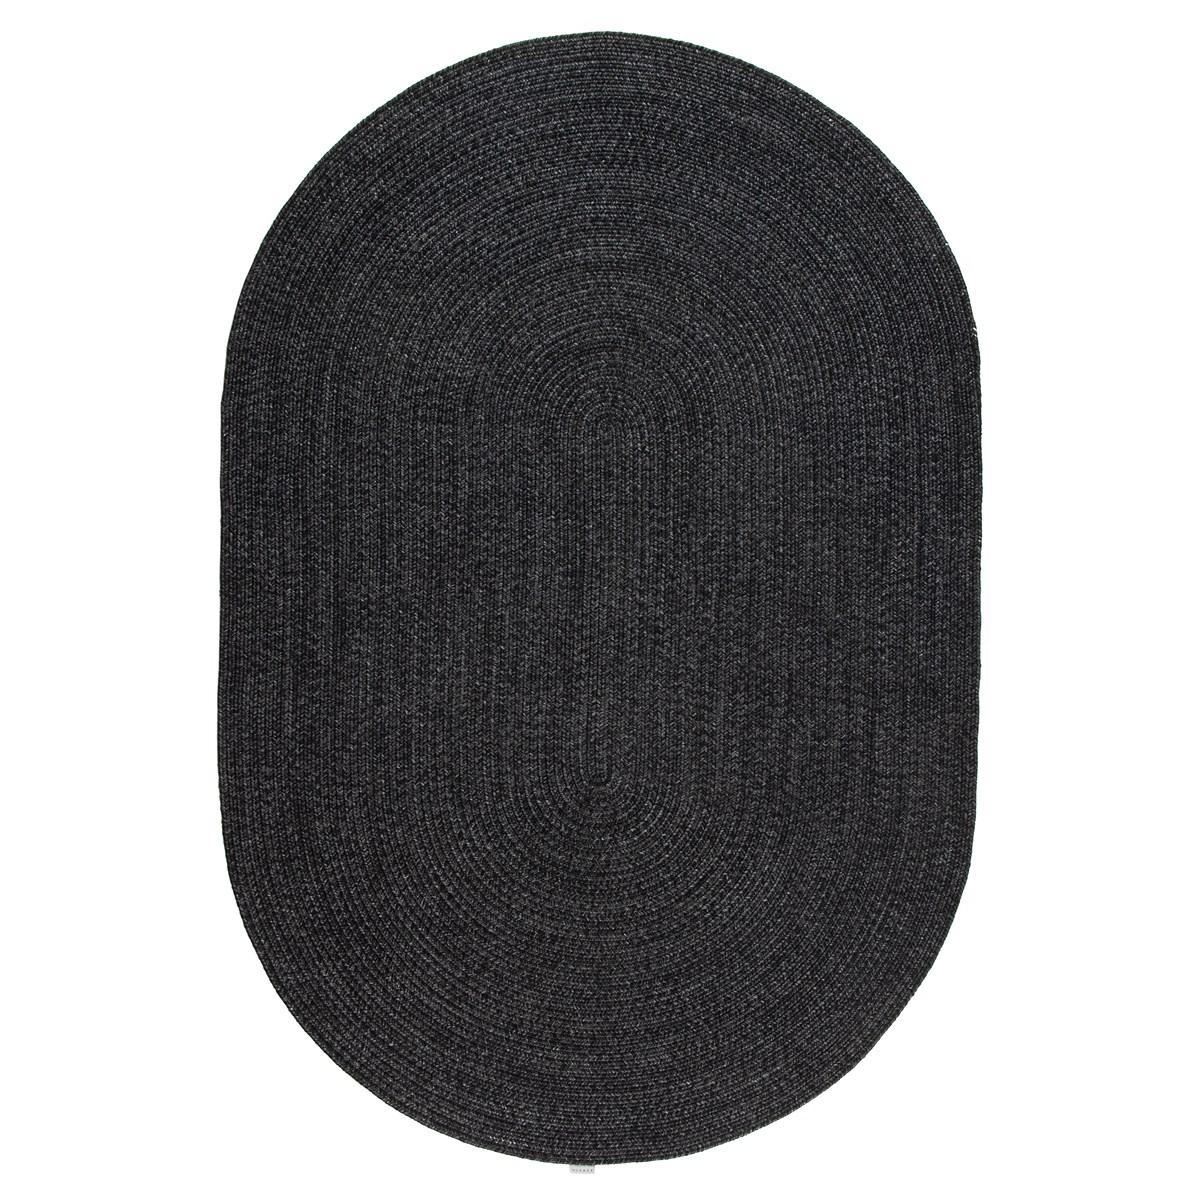 Tapis de salon en Polypropylène Gris anthracite 200x300 cm